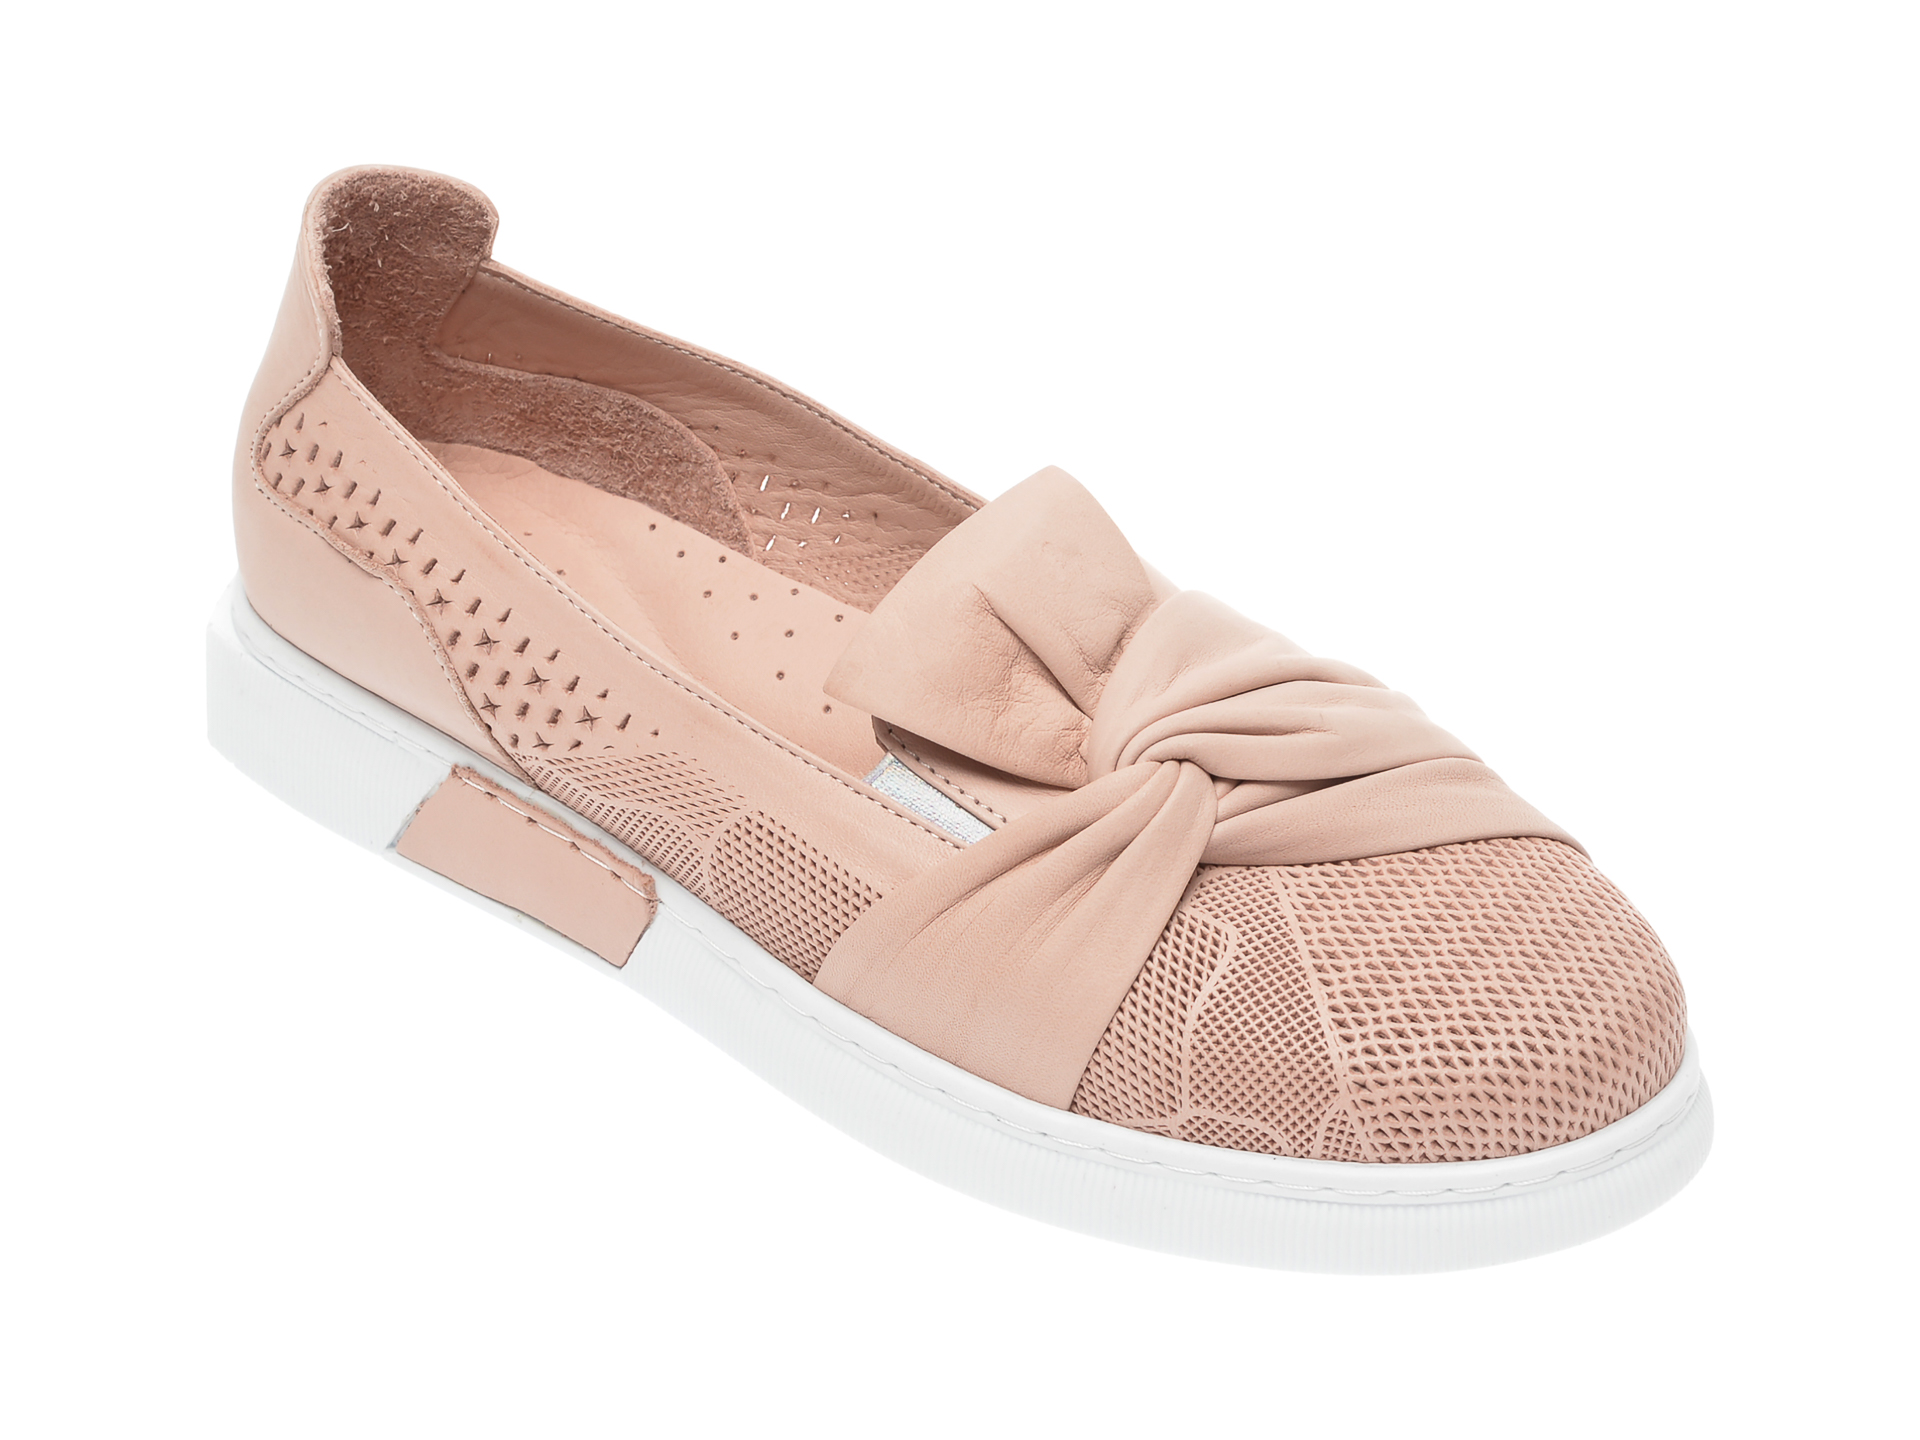 Pantofi FLAVIA PASSINI nude, 645441, din piele naturala imagine